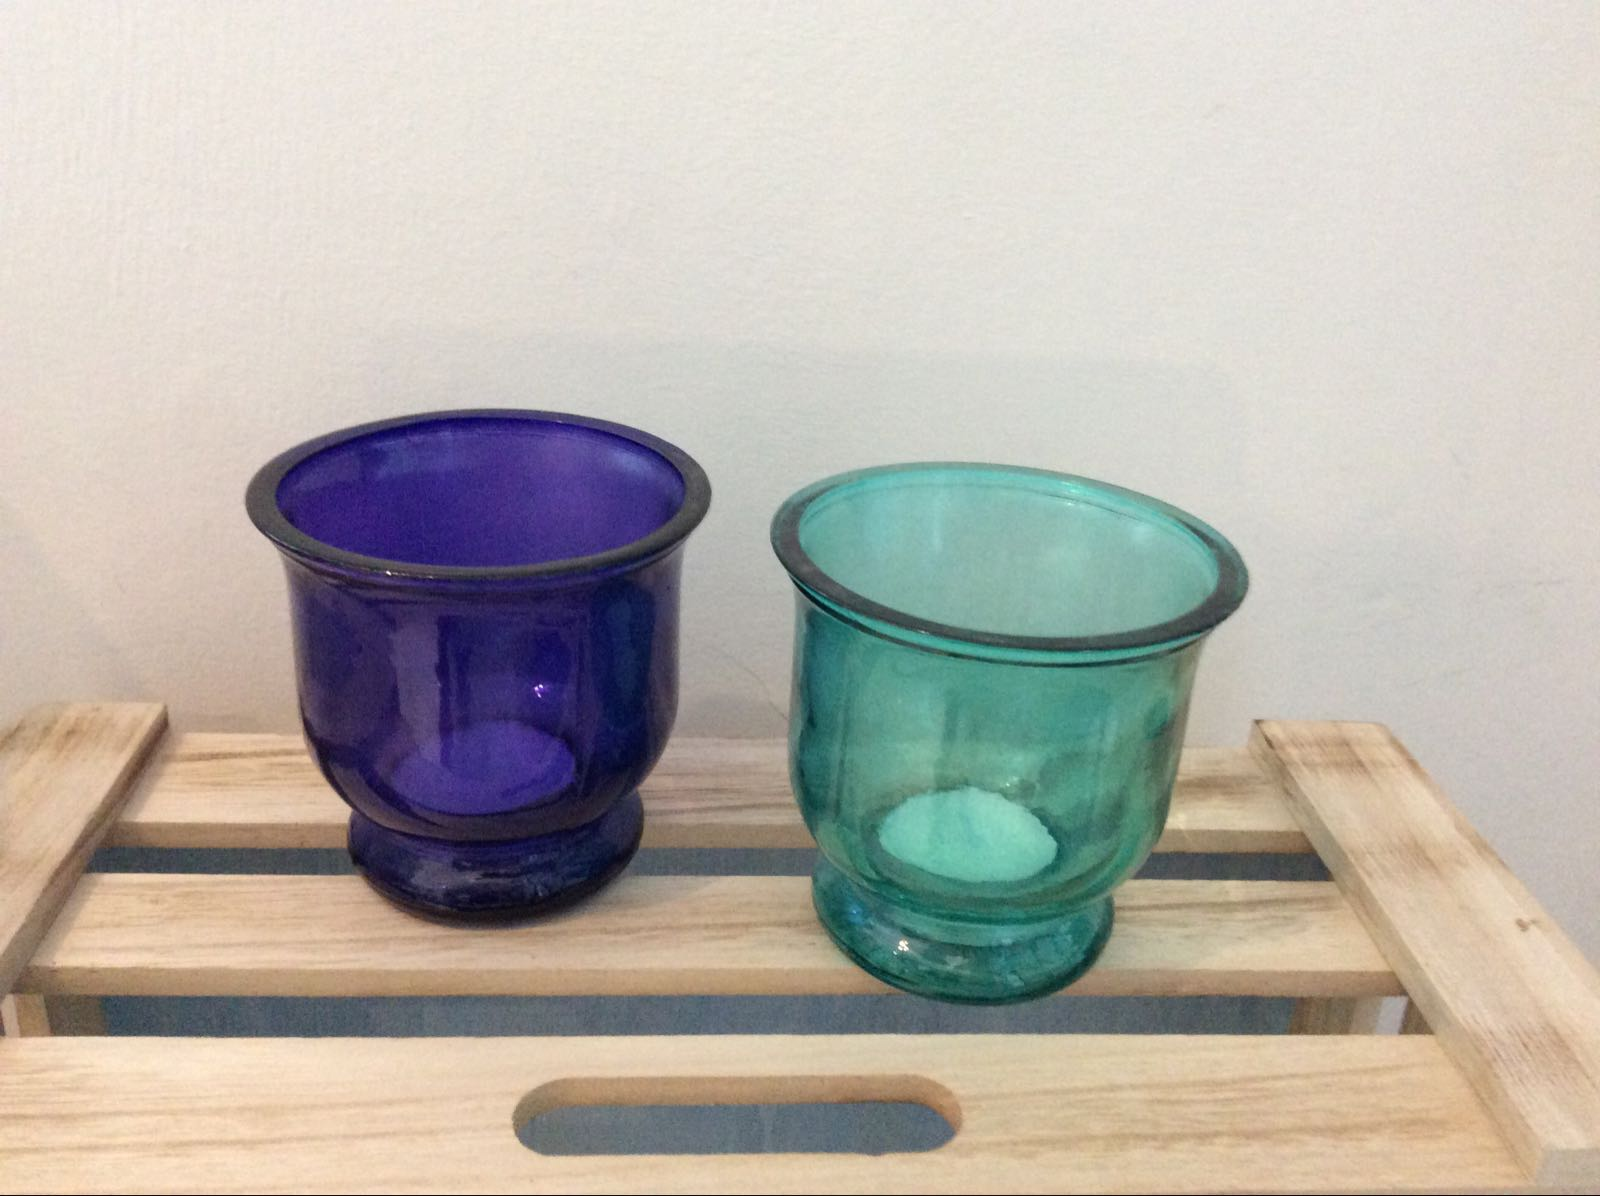 Tea light recycled glass